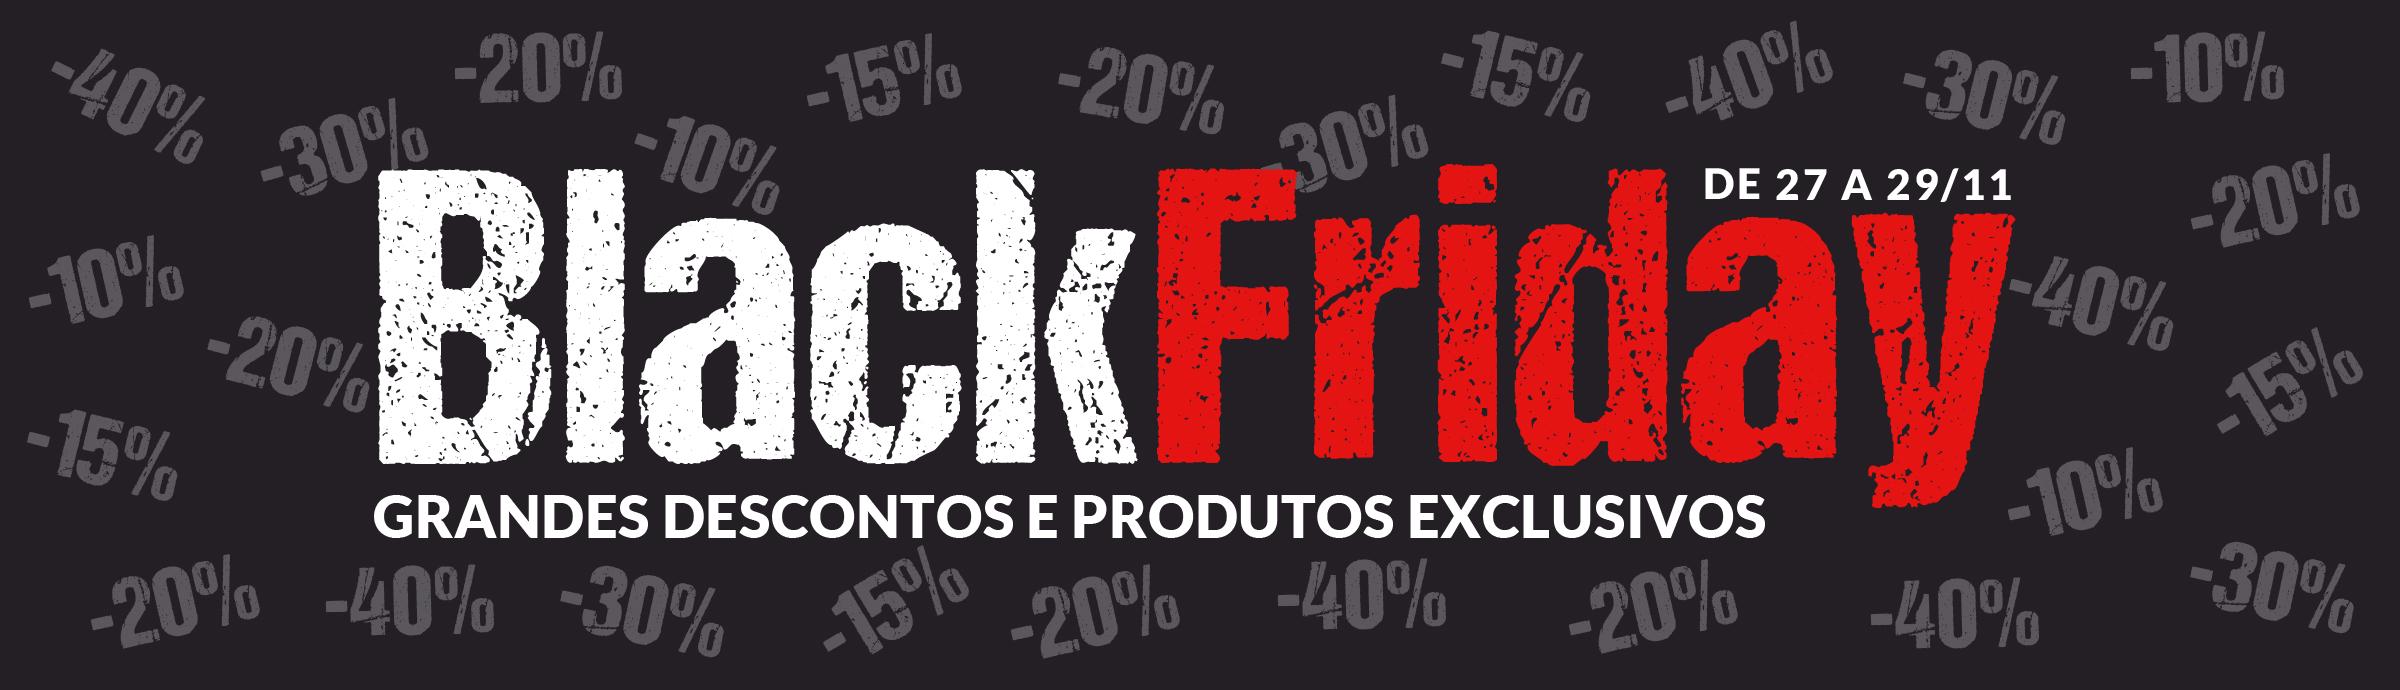 Black Friday Lego 2020